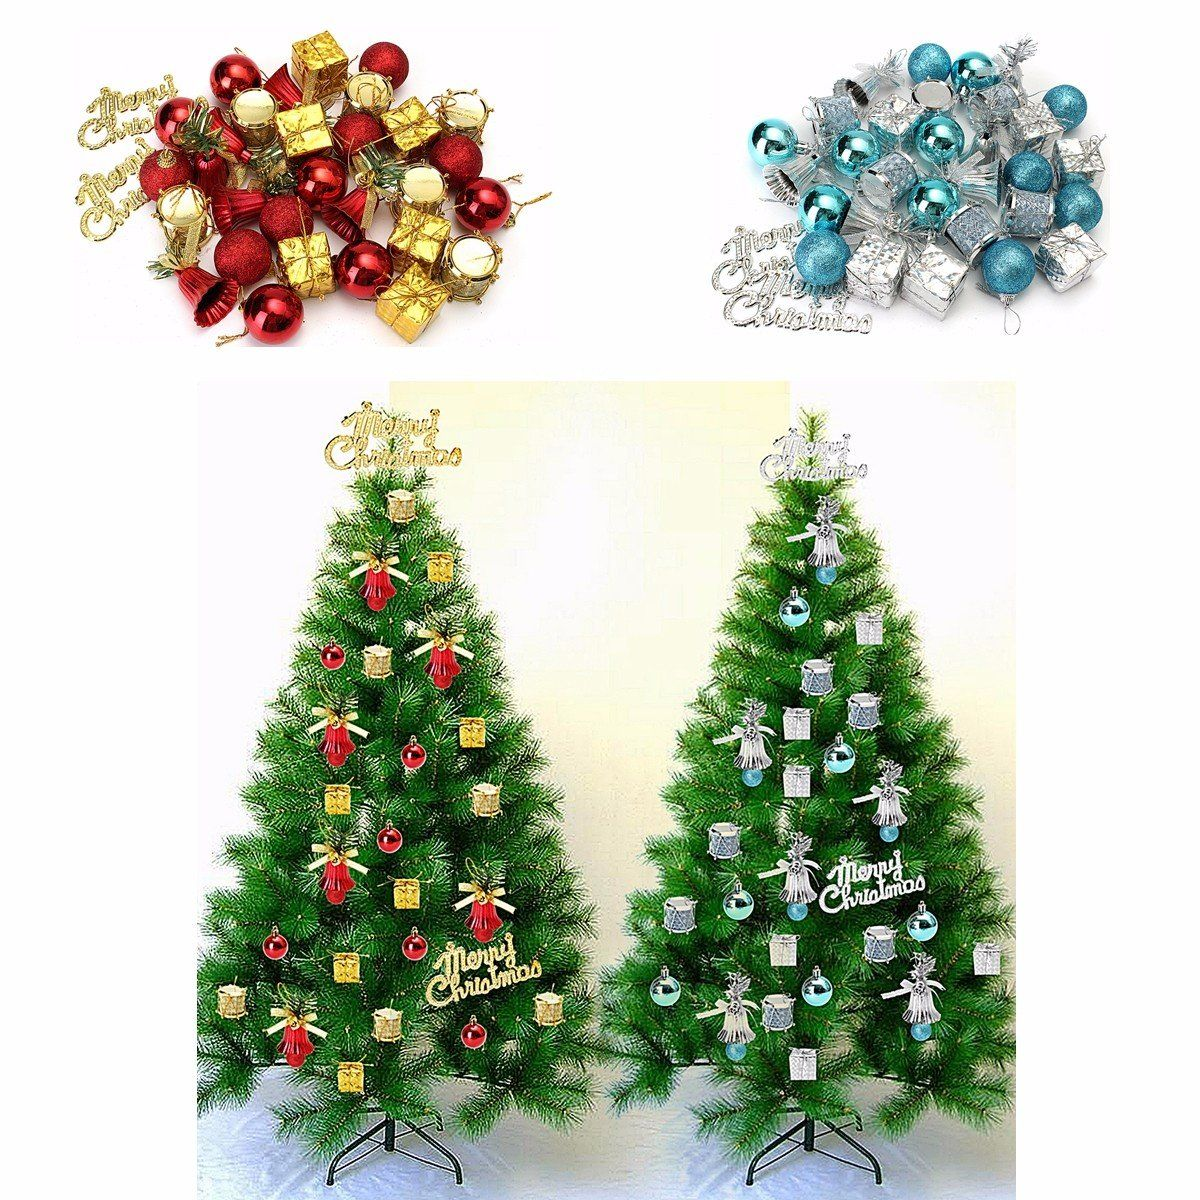 32pcs Christmas Ornaments Balls Drums Baubles Xmas Tree Pendant Home ...